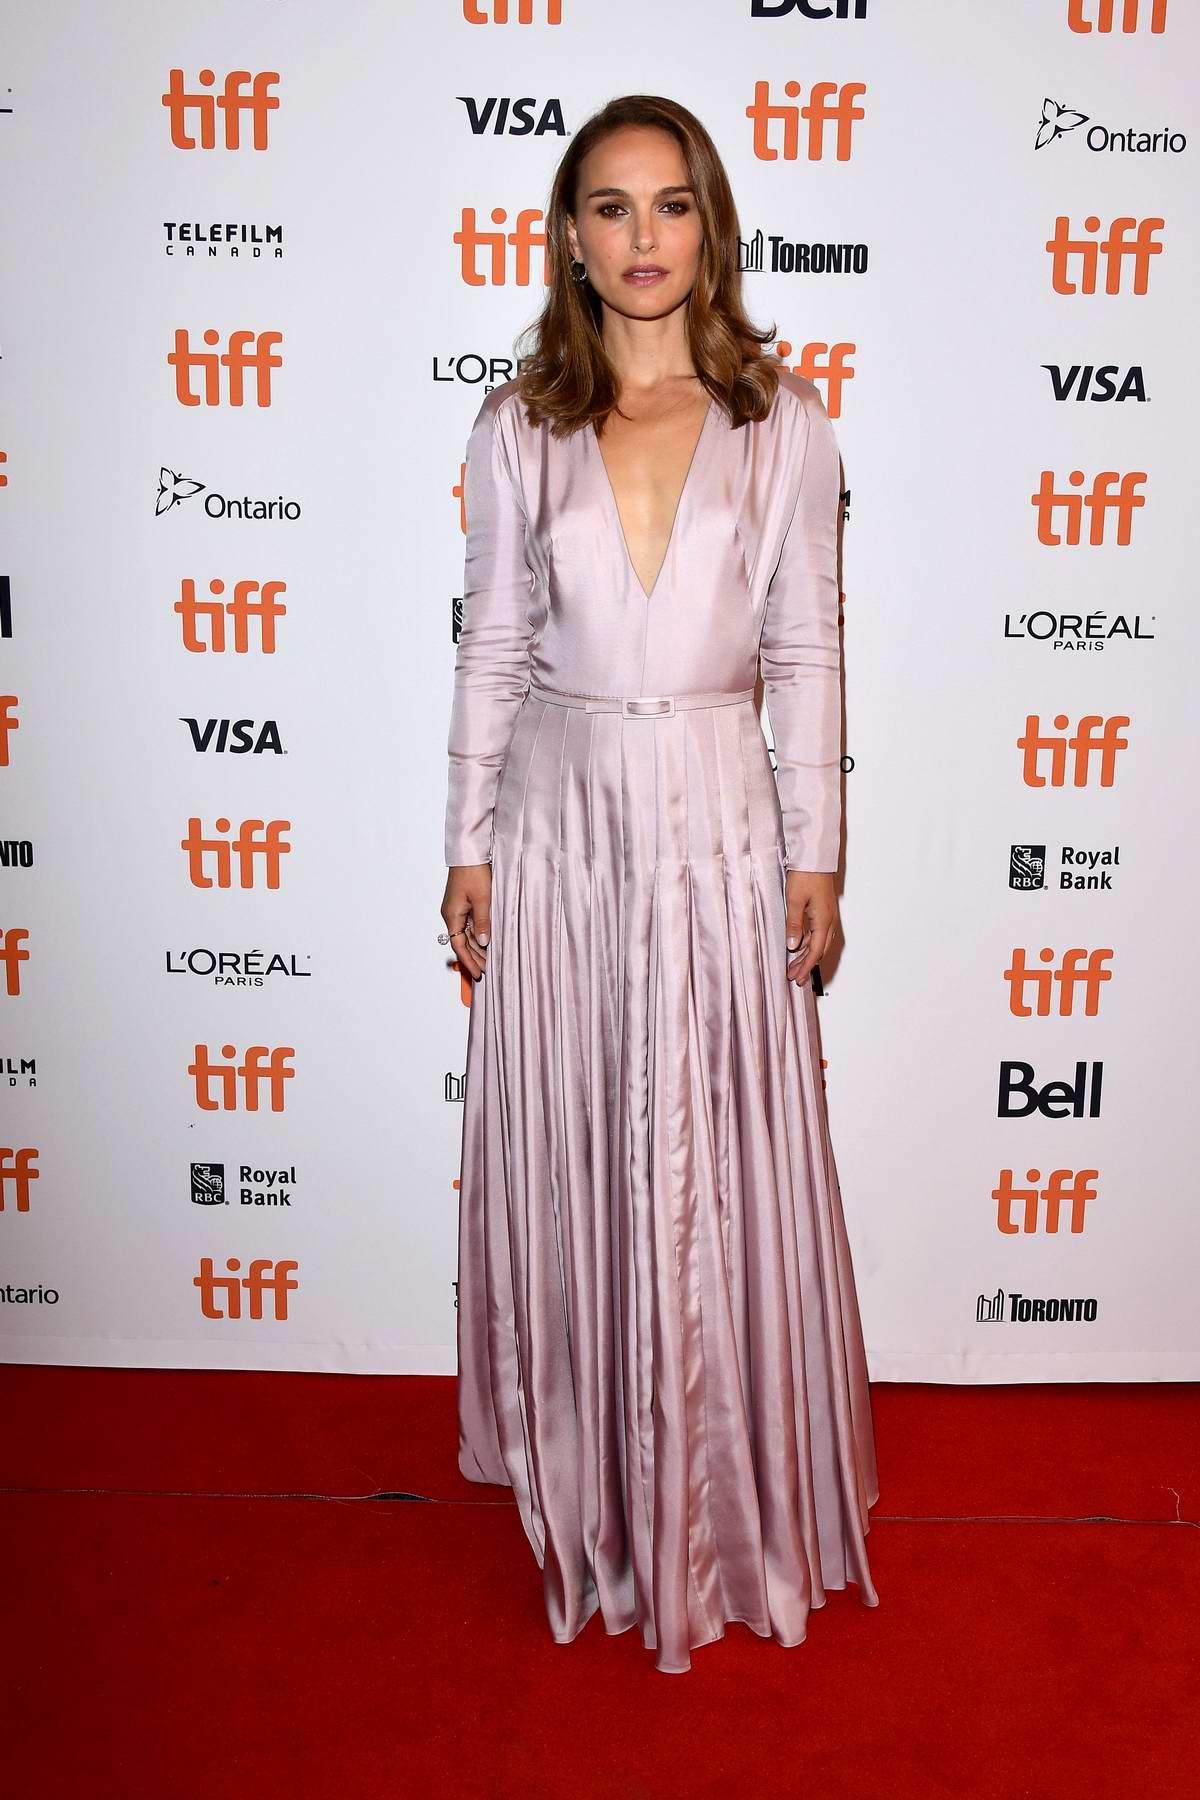 Natalie Portman attends 'Vox Lux' premiere during the Toronto International Film Festival (TIFF 2018) in Toronto, Canada